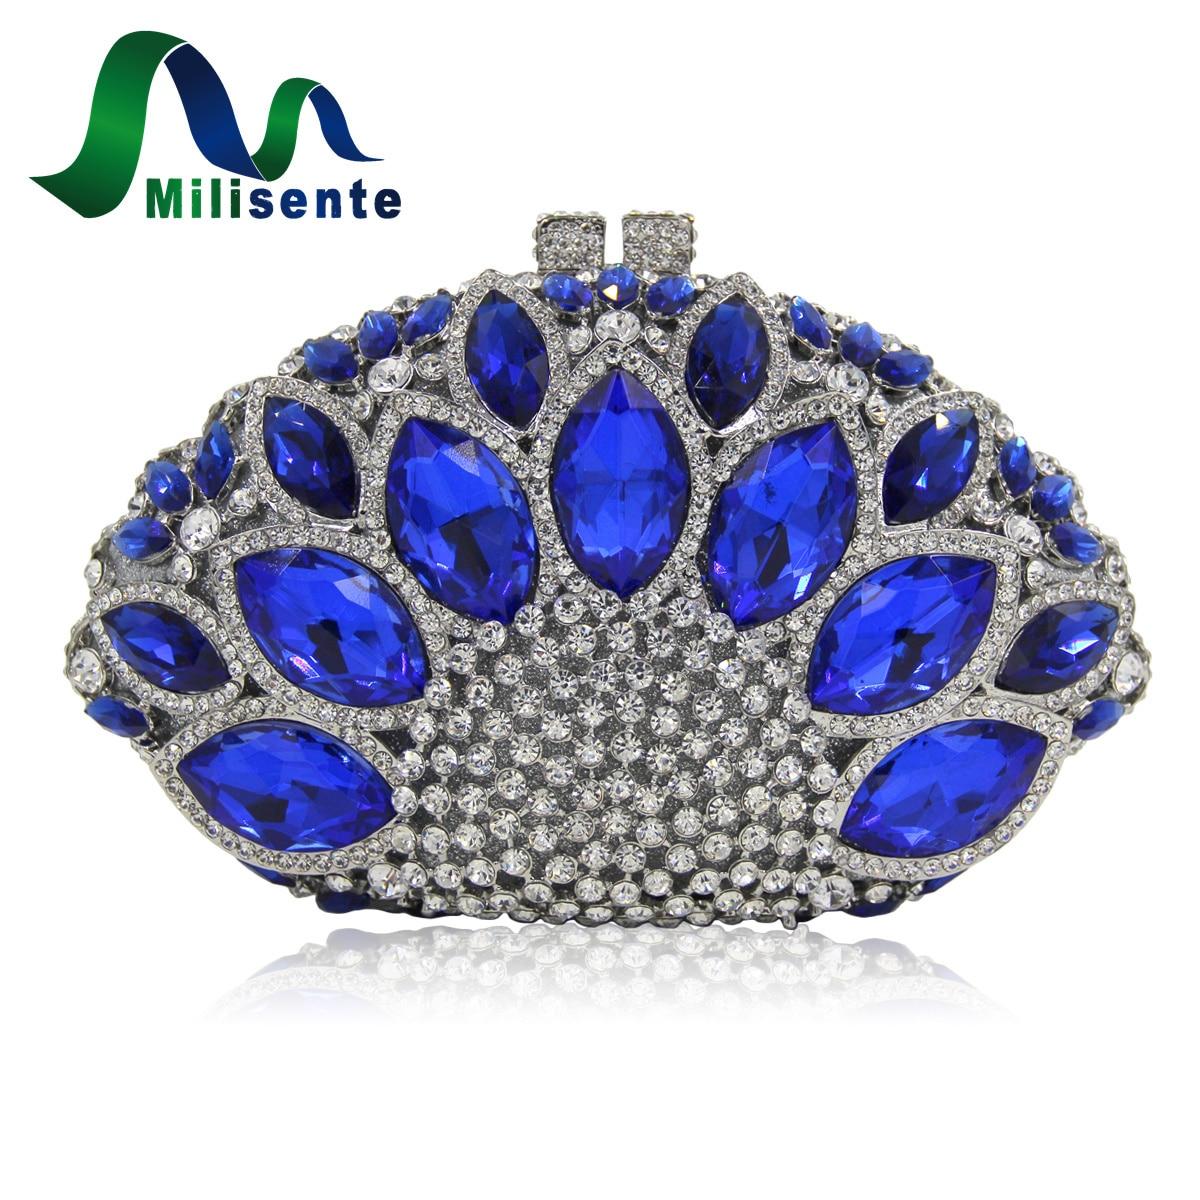 Women Luxury Crystal Bag Wedding Clutch Purse Party Handbags Wholesale Silver luxury crystal clutch handbag women evening bag wedding party purses banquet